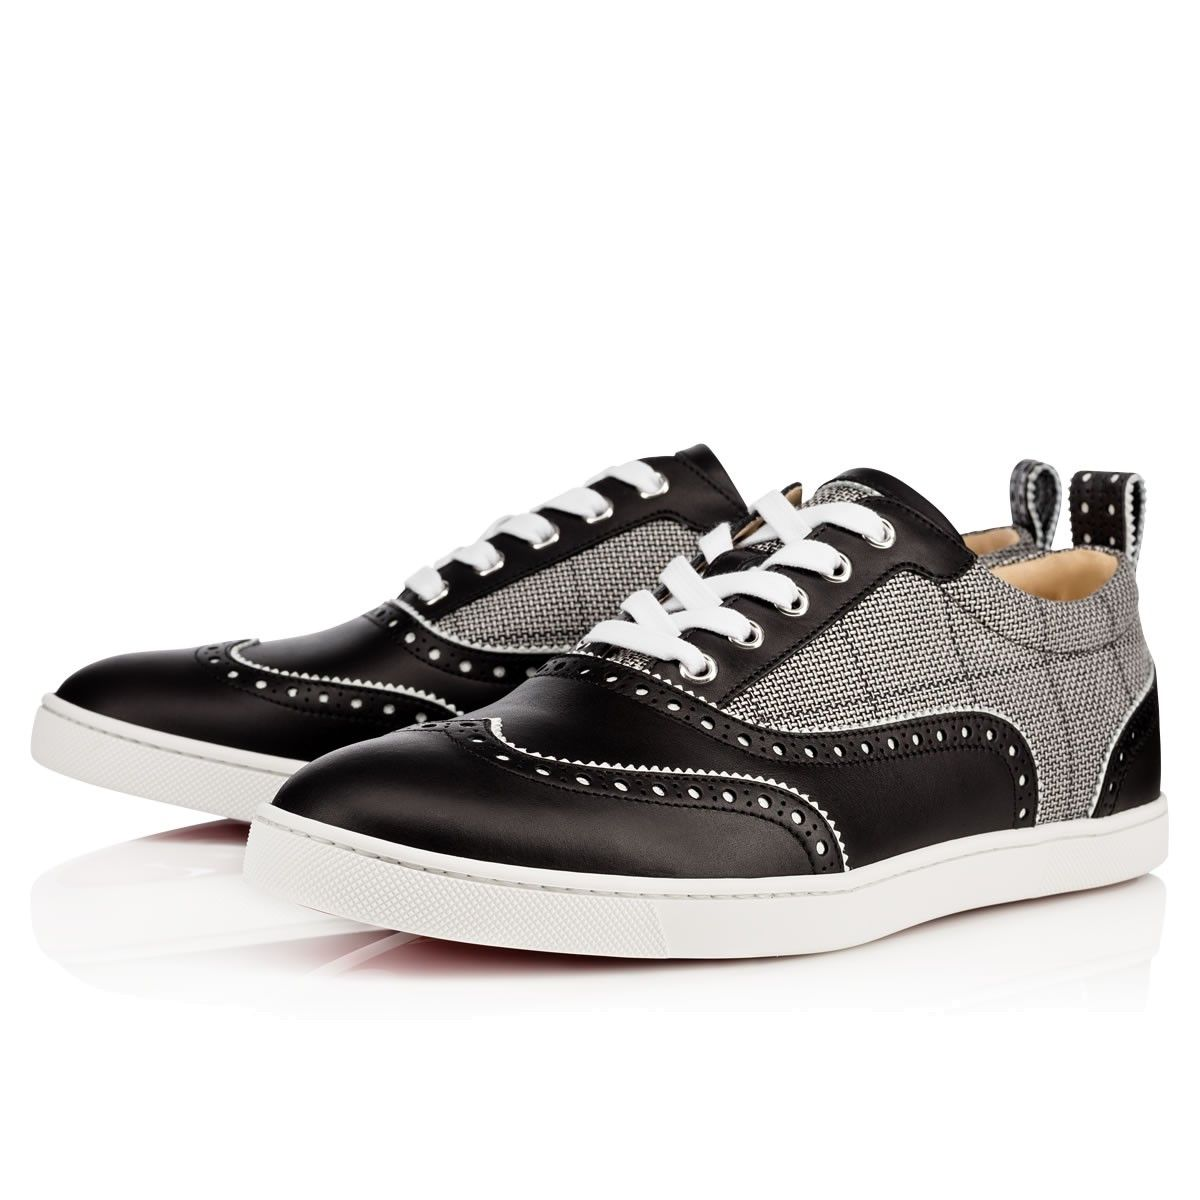 Men Shoes - Riviero Calf/tissu Dorsilk - Christian Louboutin